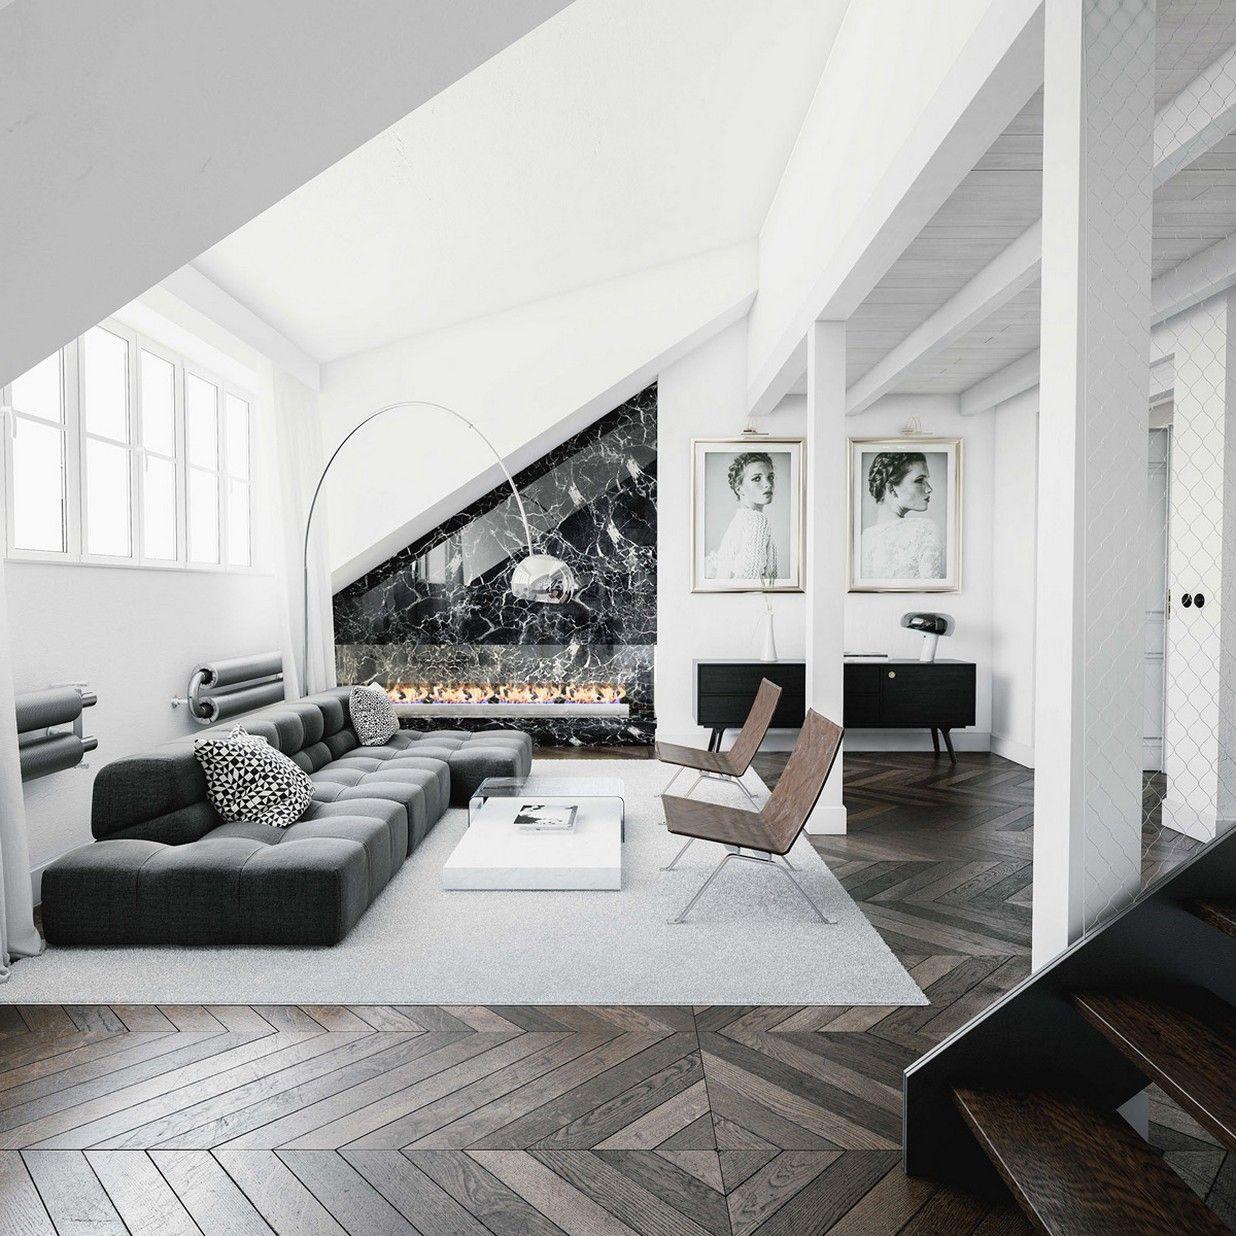 50 Innovative Black White Living Room Decor Ideas In 2020 Modern White Living Room Black And White Living Room Decor Black Living Room #white #and #black #living #room #decor #ideas